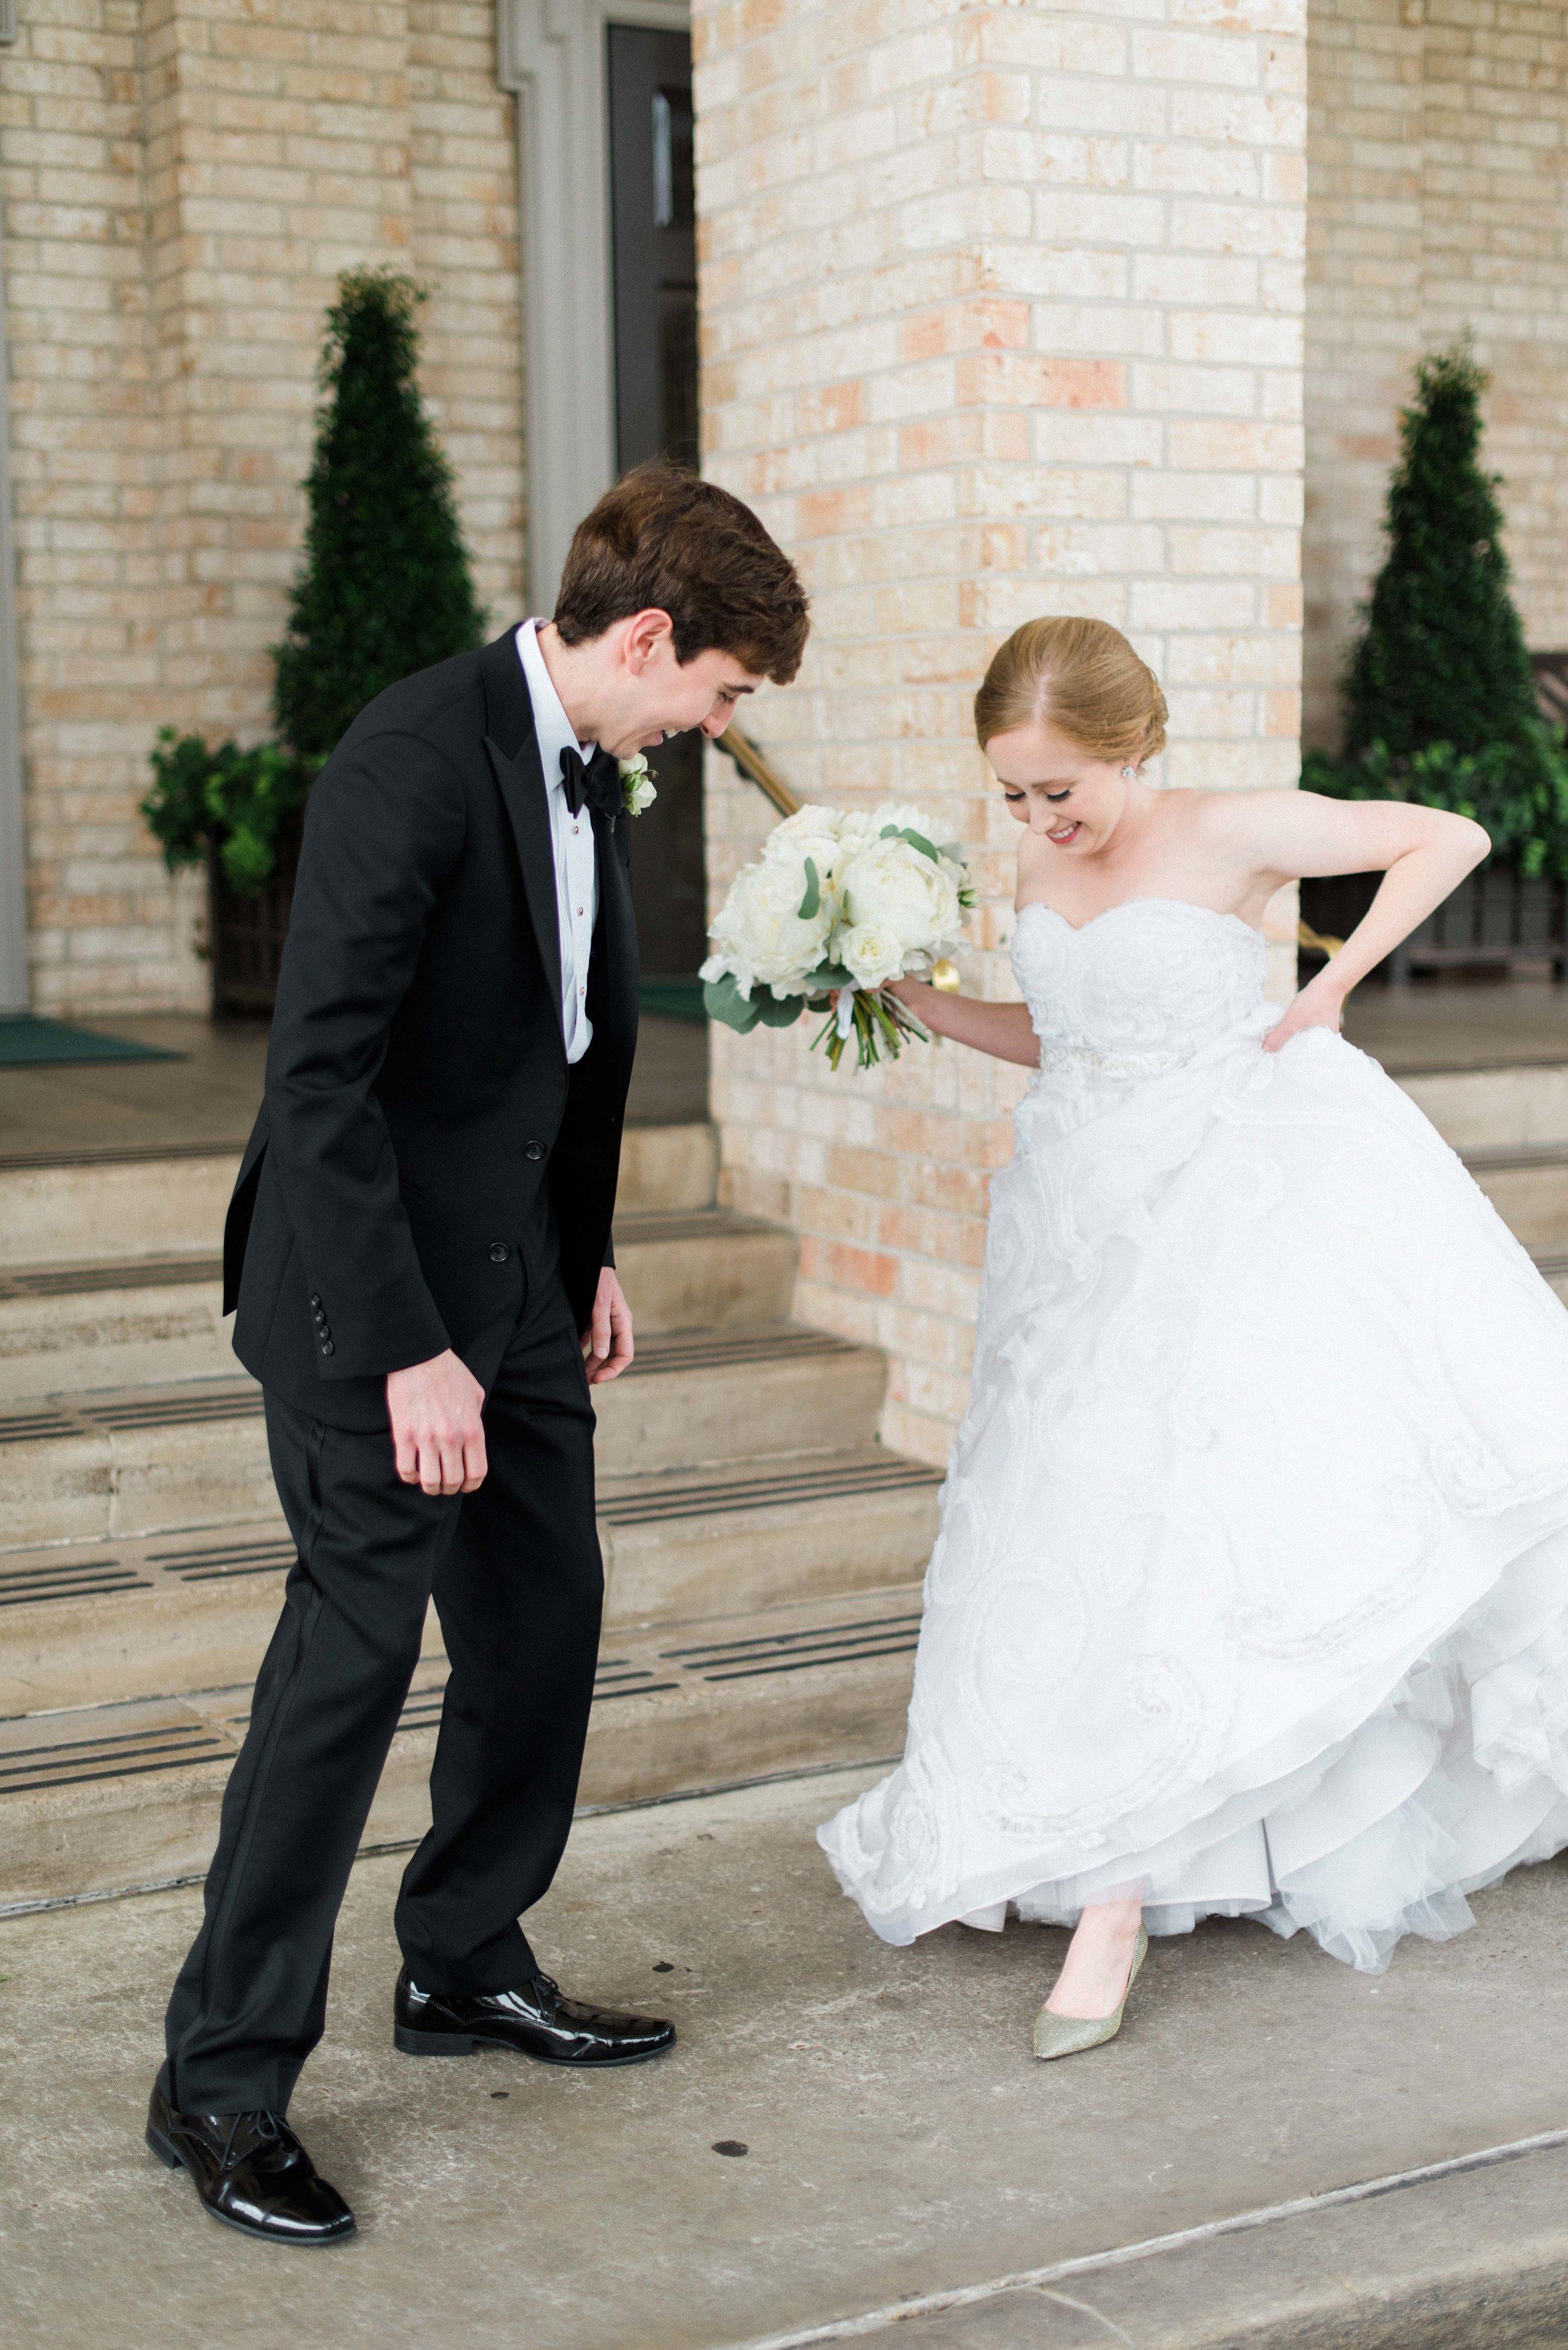 Fine-Art-Film-Houston-Wedding-Photographer-Best-Top-Luxury-Texas-Austin-Dallas-Destination-Dana-Fernandez-Photography-River-Oaks-Country-Club-South-Main-Baptist-Ceremony-Reception-Wedding-22.jpg